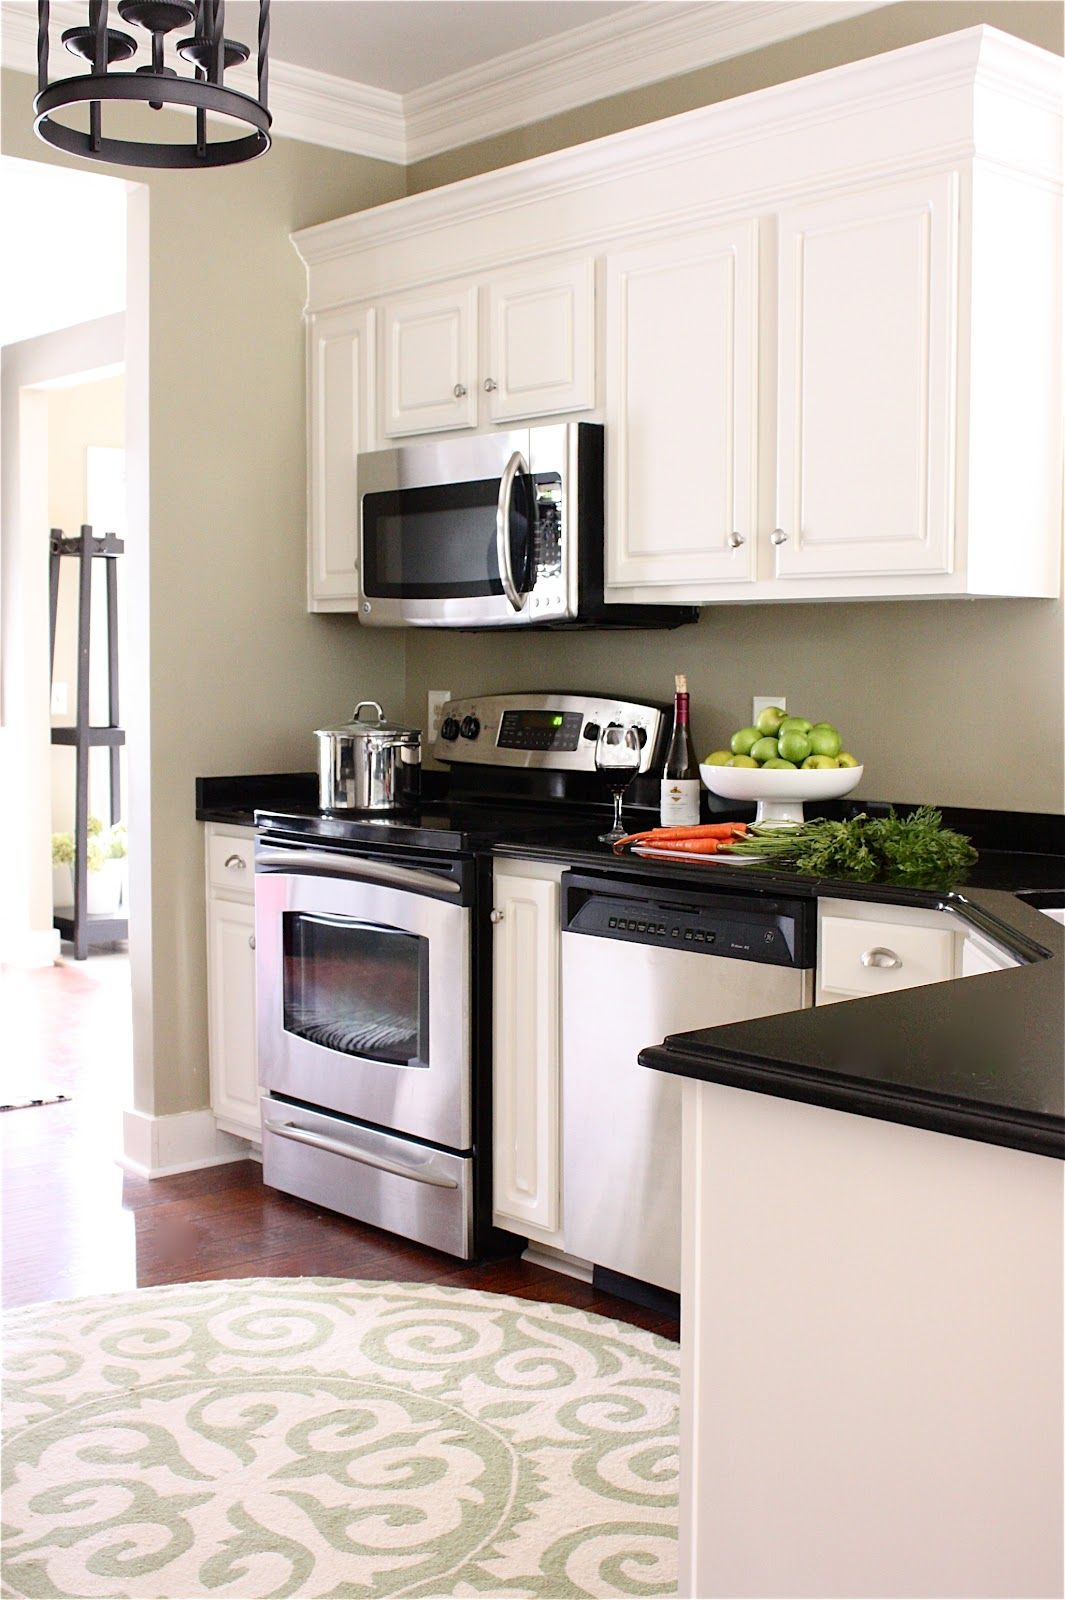 Make Kitchen Cabinets Html on make kitchen island, make kitchen table, make kitchen storage, make kitchen shelves, make kitchen counters, make beds, make kitchen chairs,